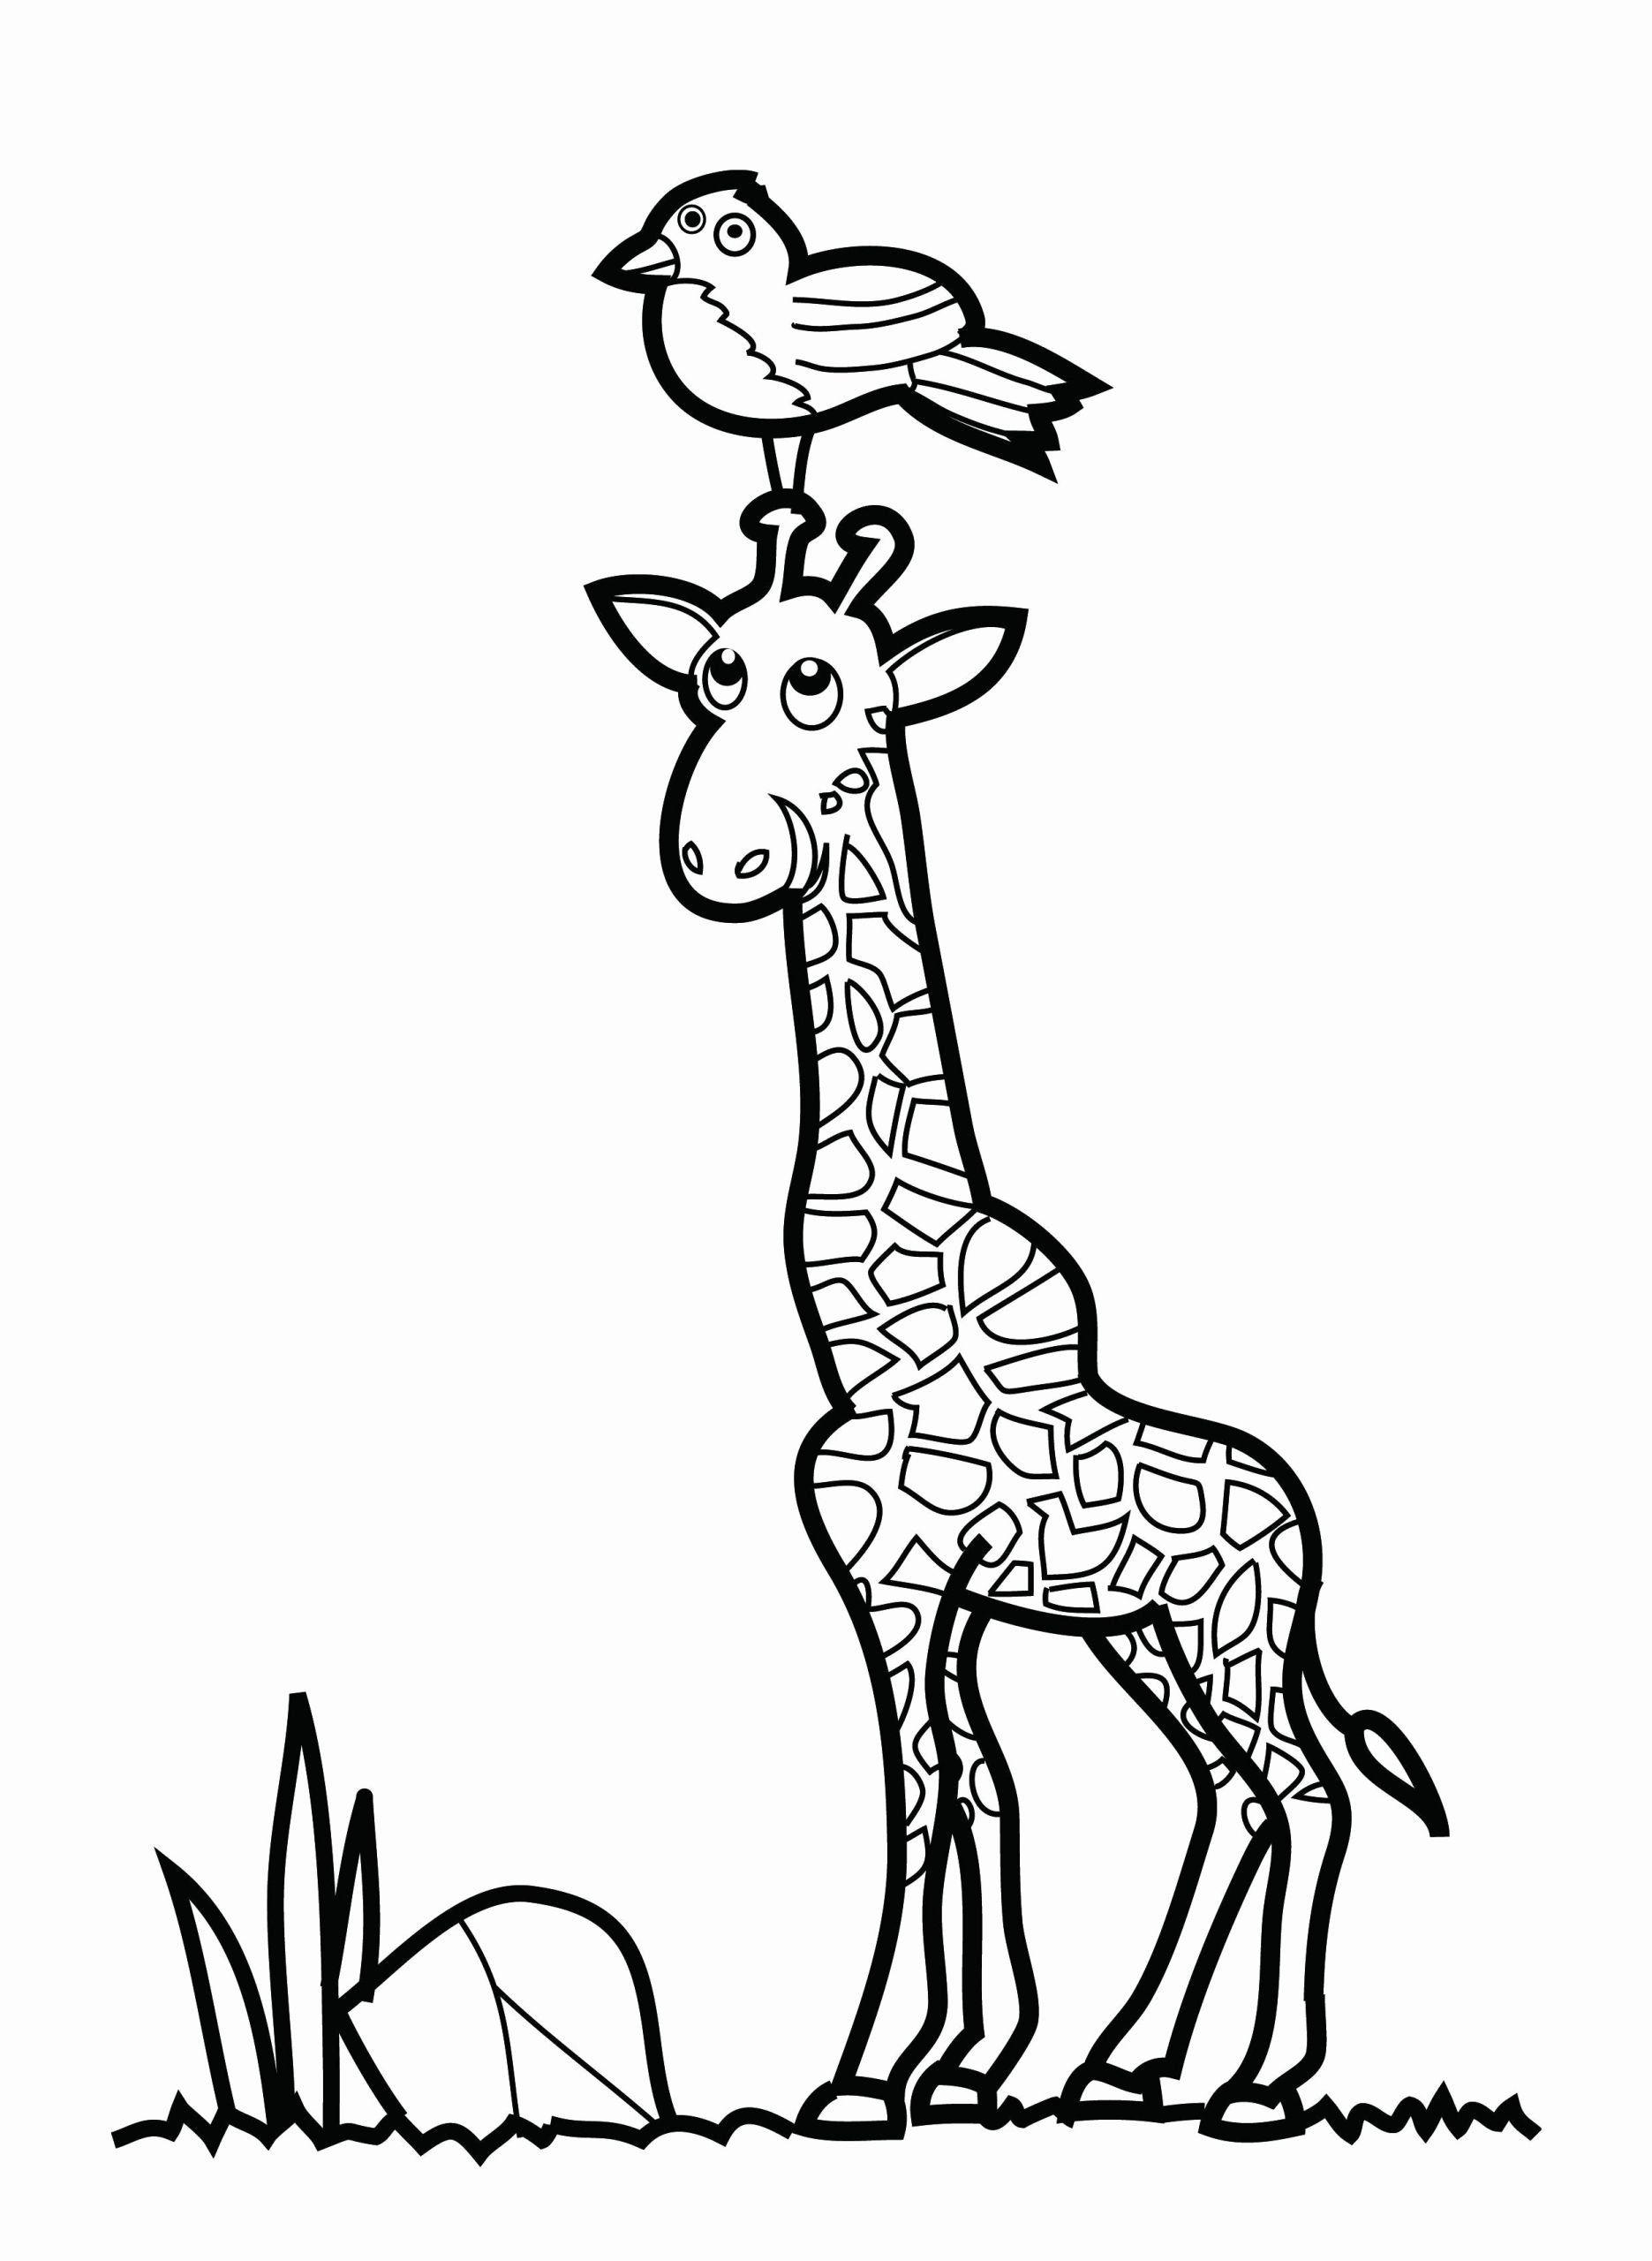 Coloring Books For Toddler New Malvorlagen Fur Kinder Ausmalbilder Giraffe Kostenlos Animal Coloring Pages Giraffe Coloring Pages Toddler Coloring Book